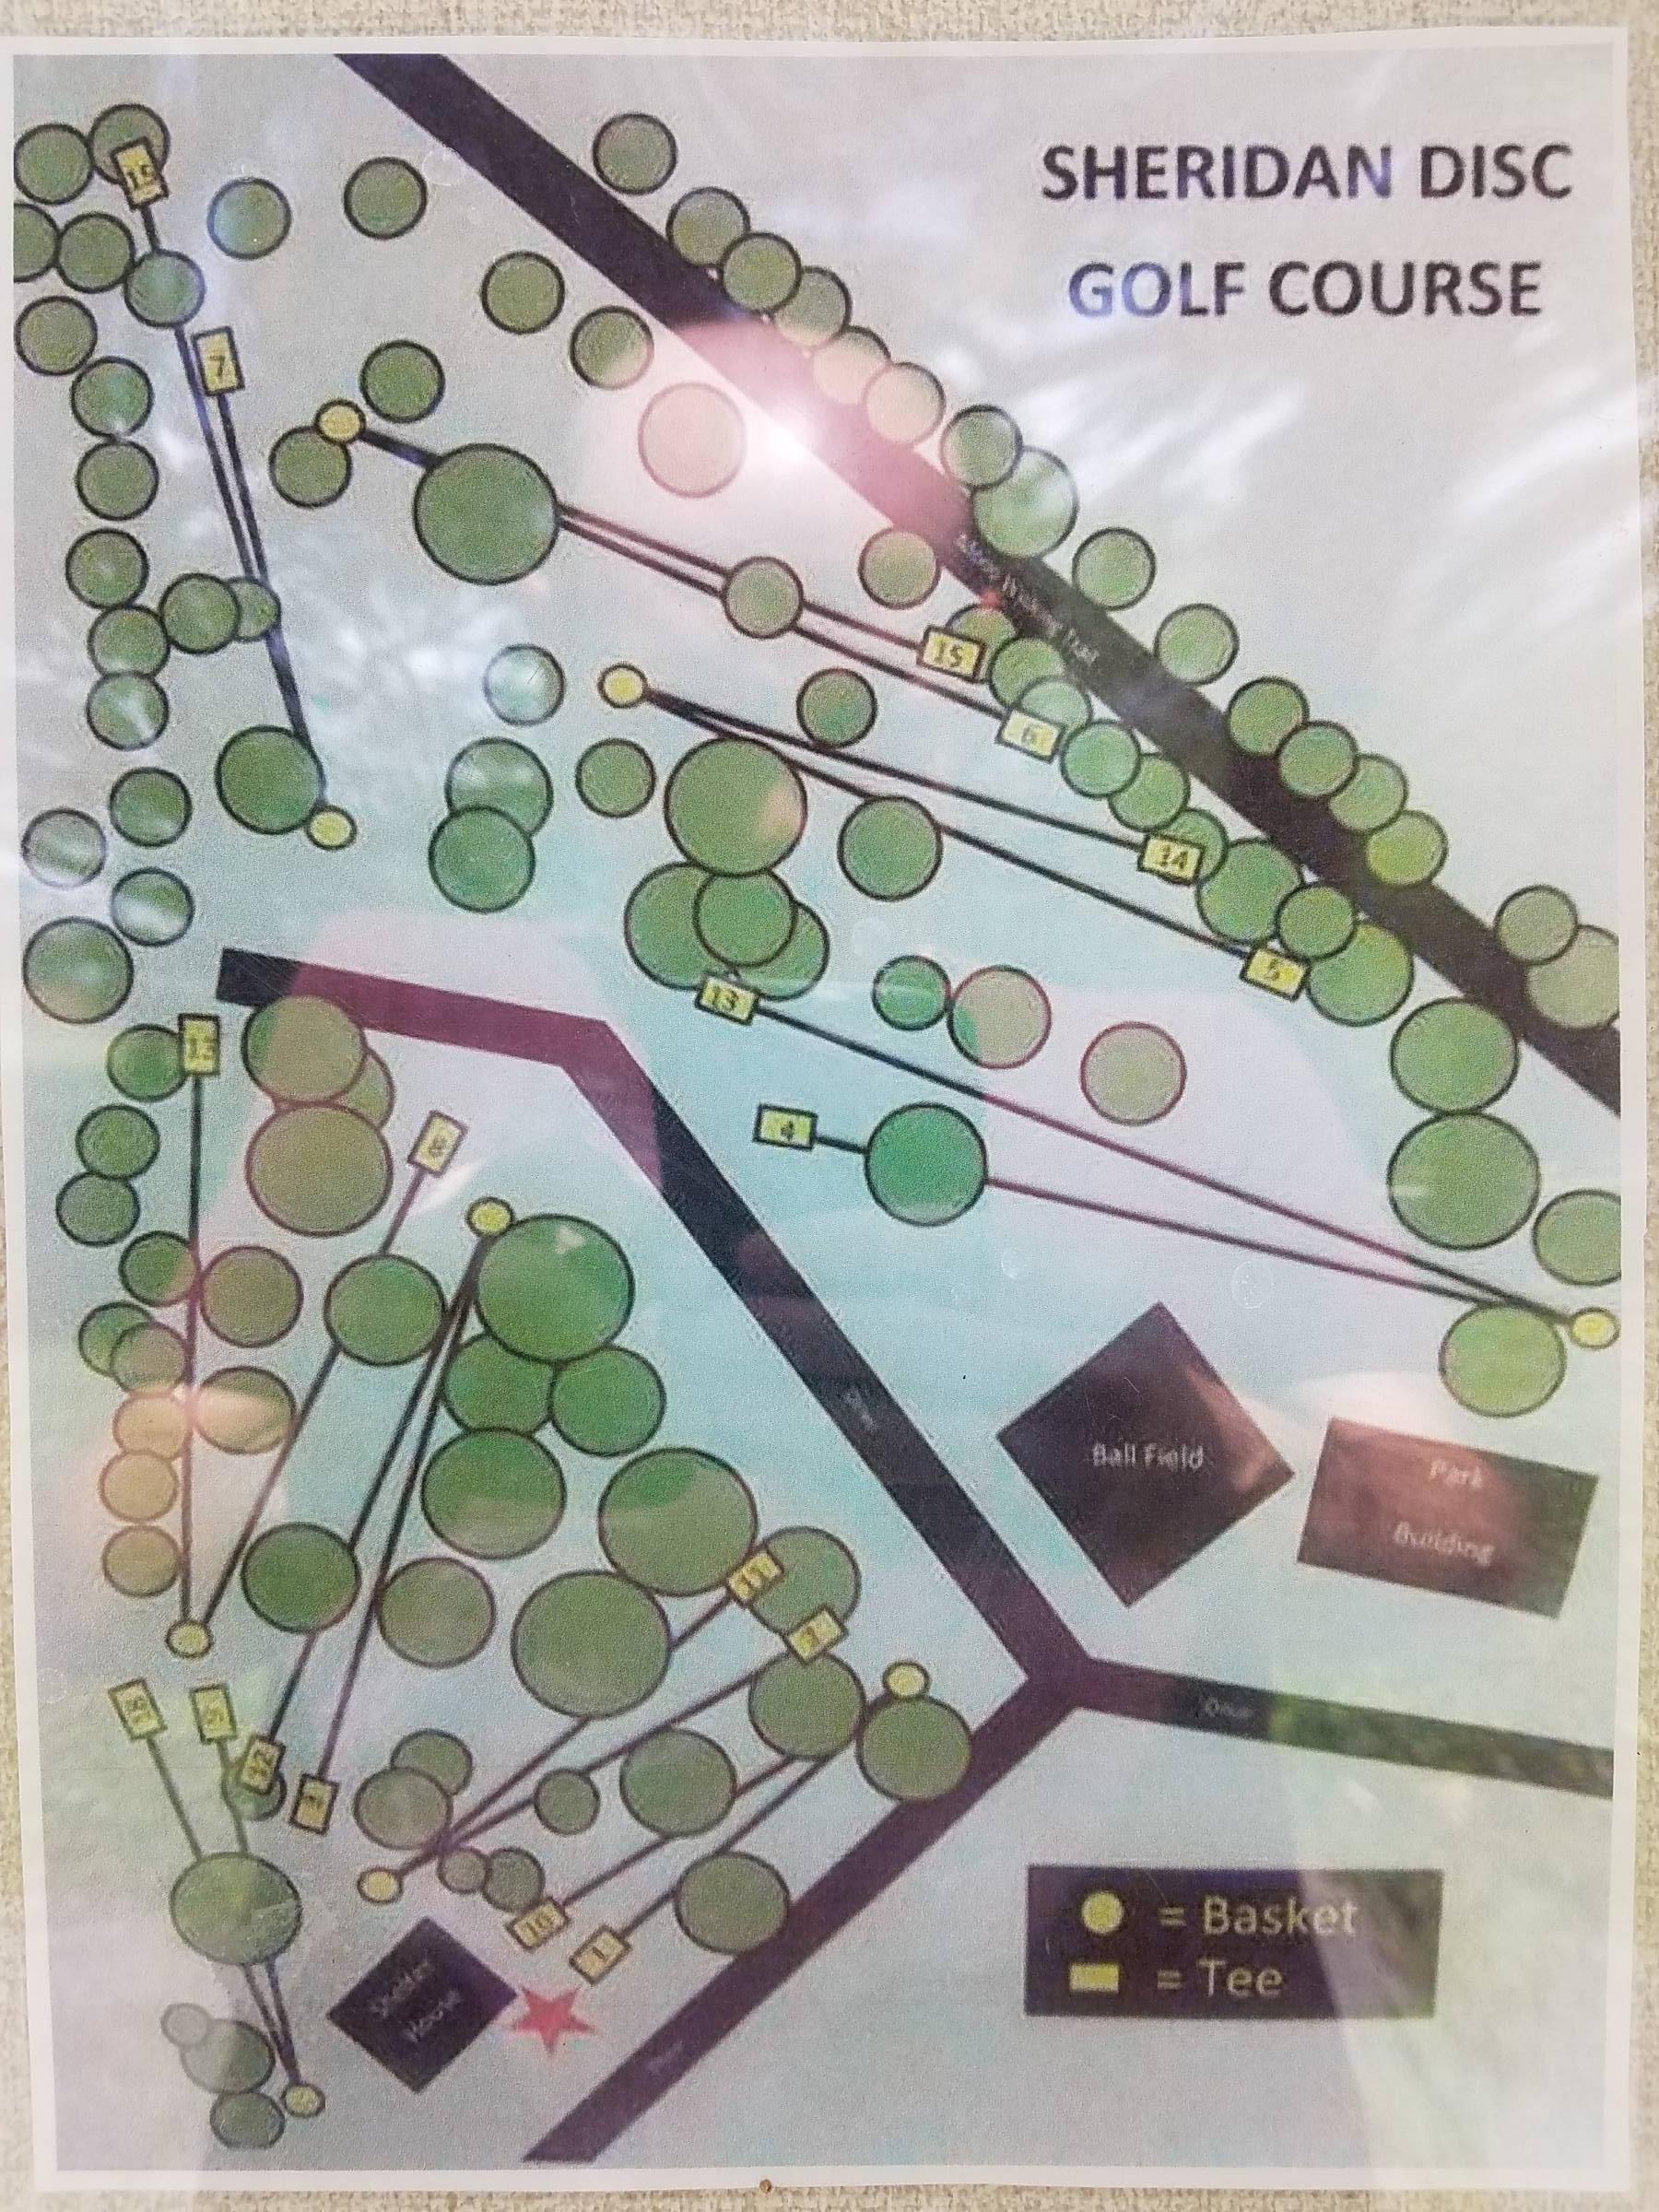 Hole 1 Biddle Park Sheridan In Disc Golf Courses Disc Golf Scene